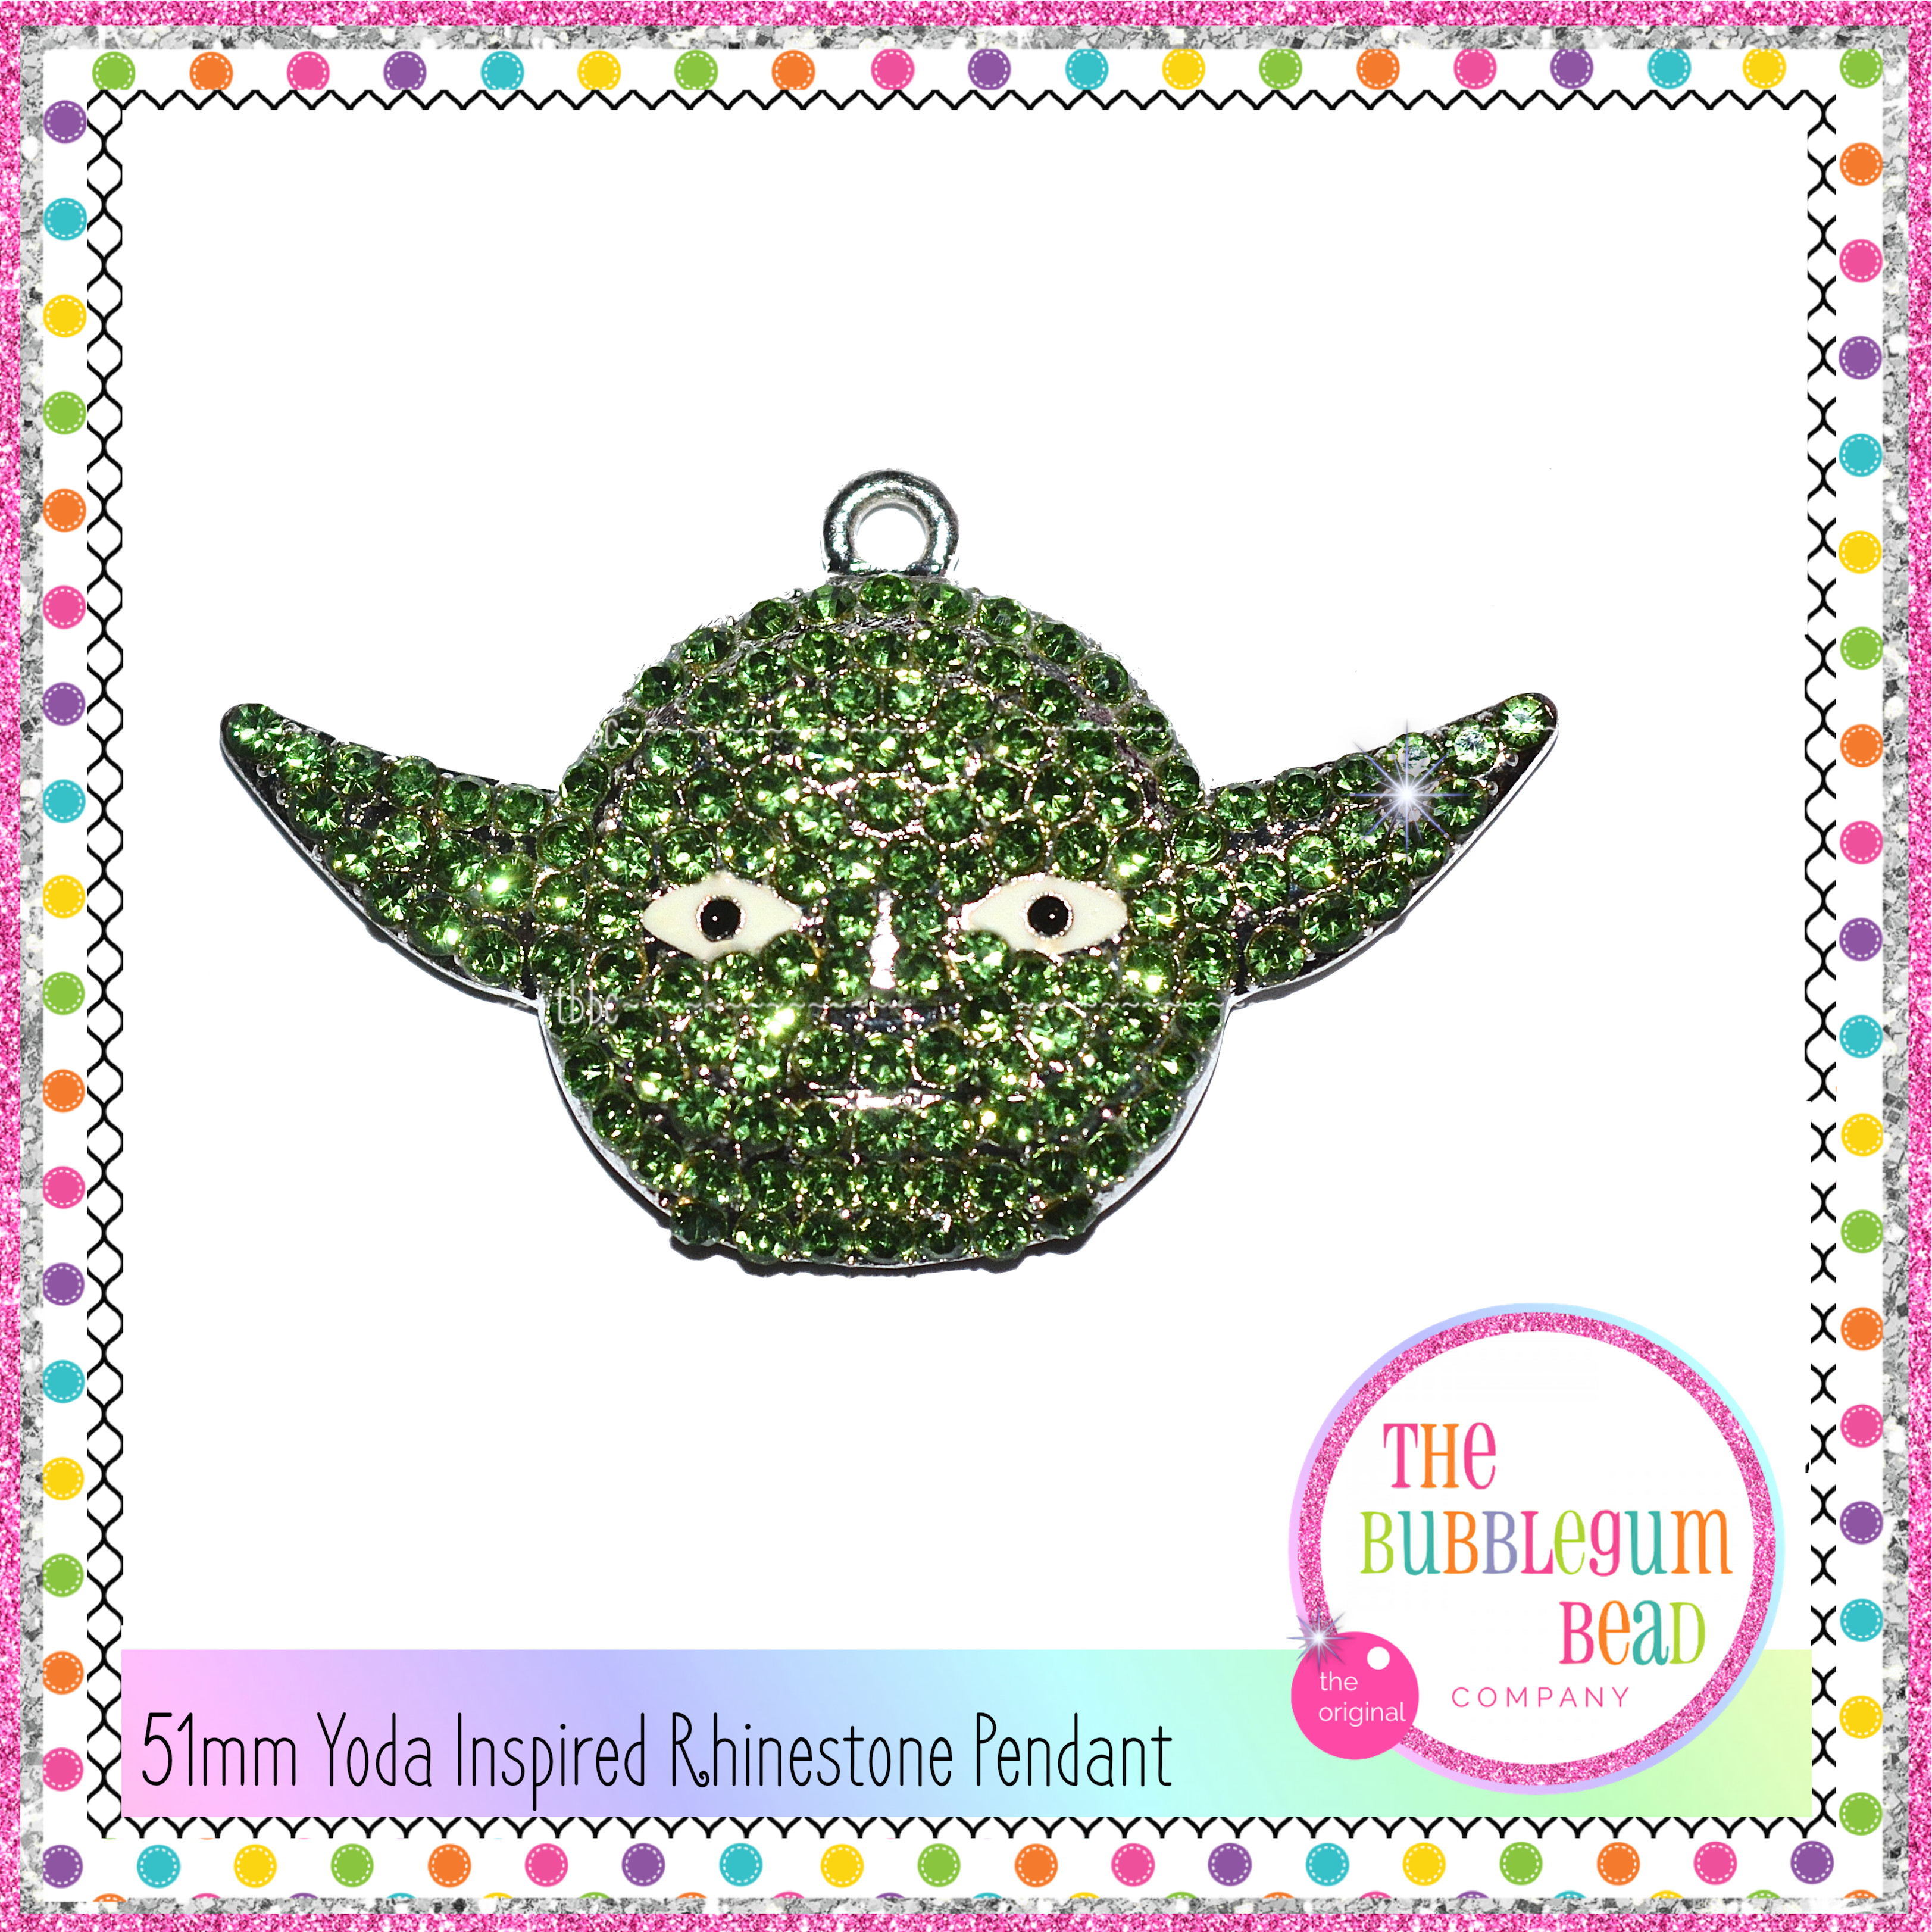 Yoda datingMTN dating vinkkejä koodi